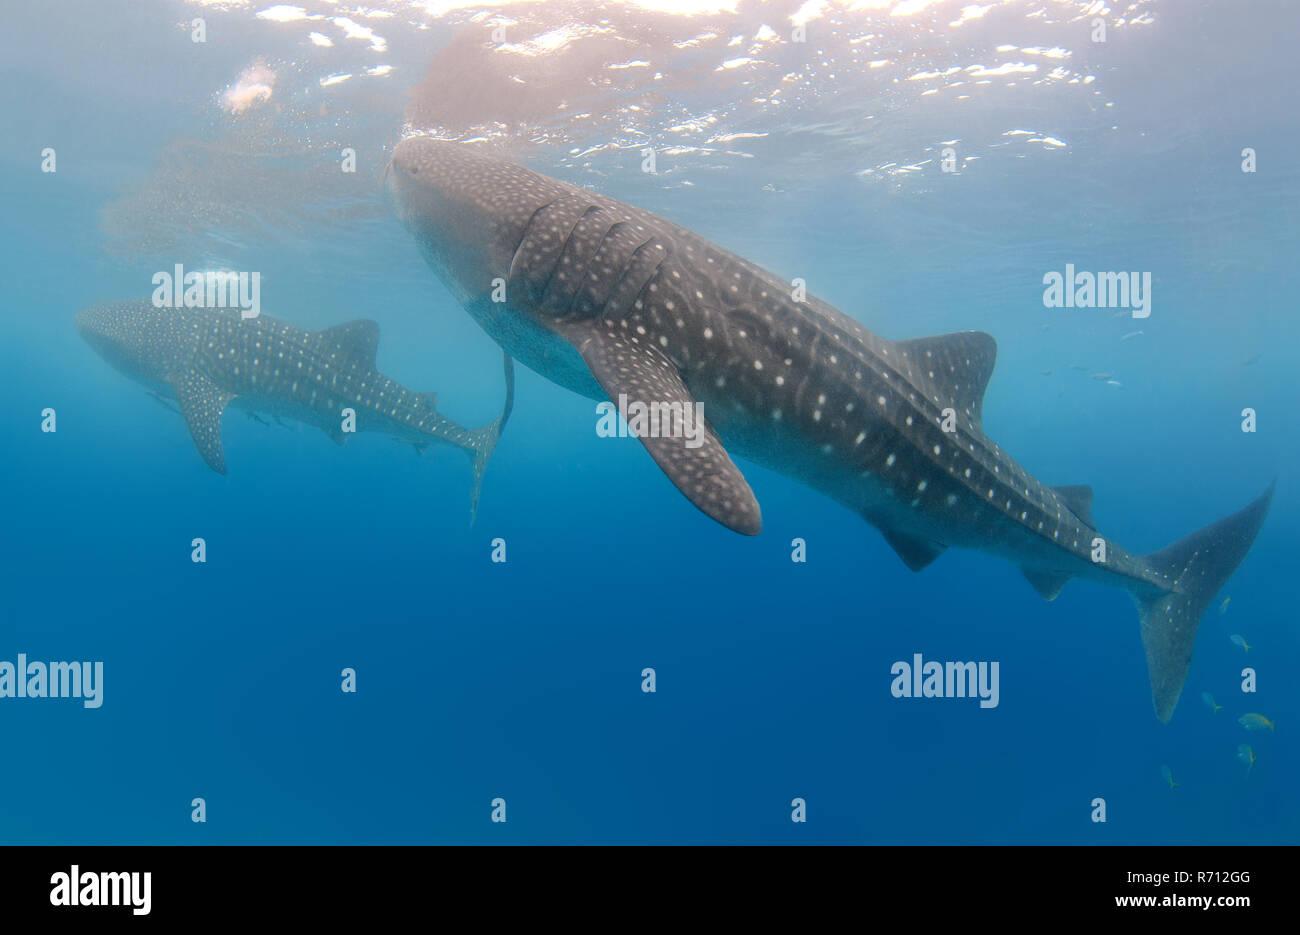 Whale Shark, also Basking Shark (Rhincodon typus), Bohol Sea, Oslob, Cebu, Philippines - Stock Image